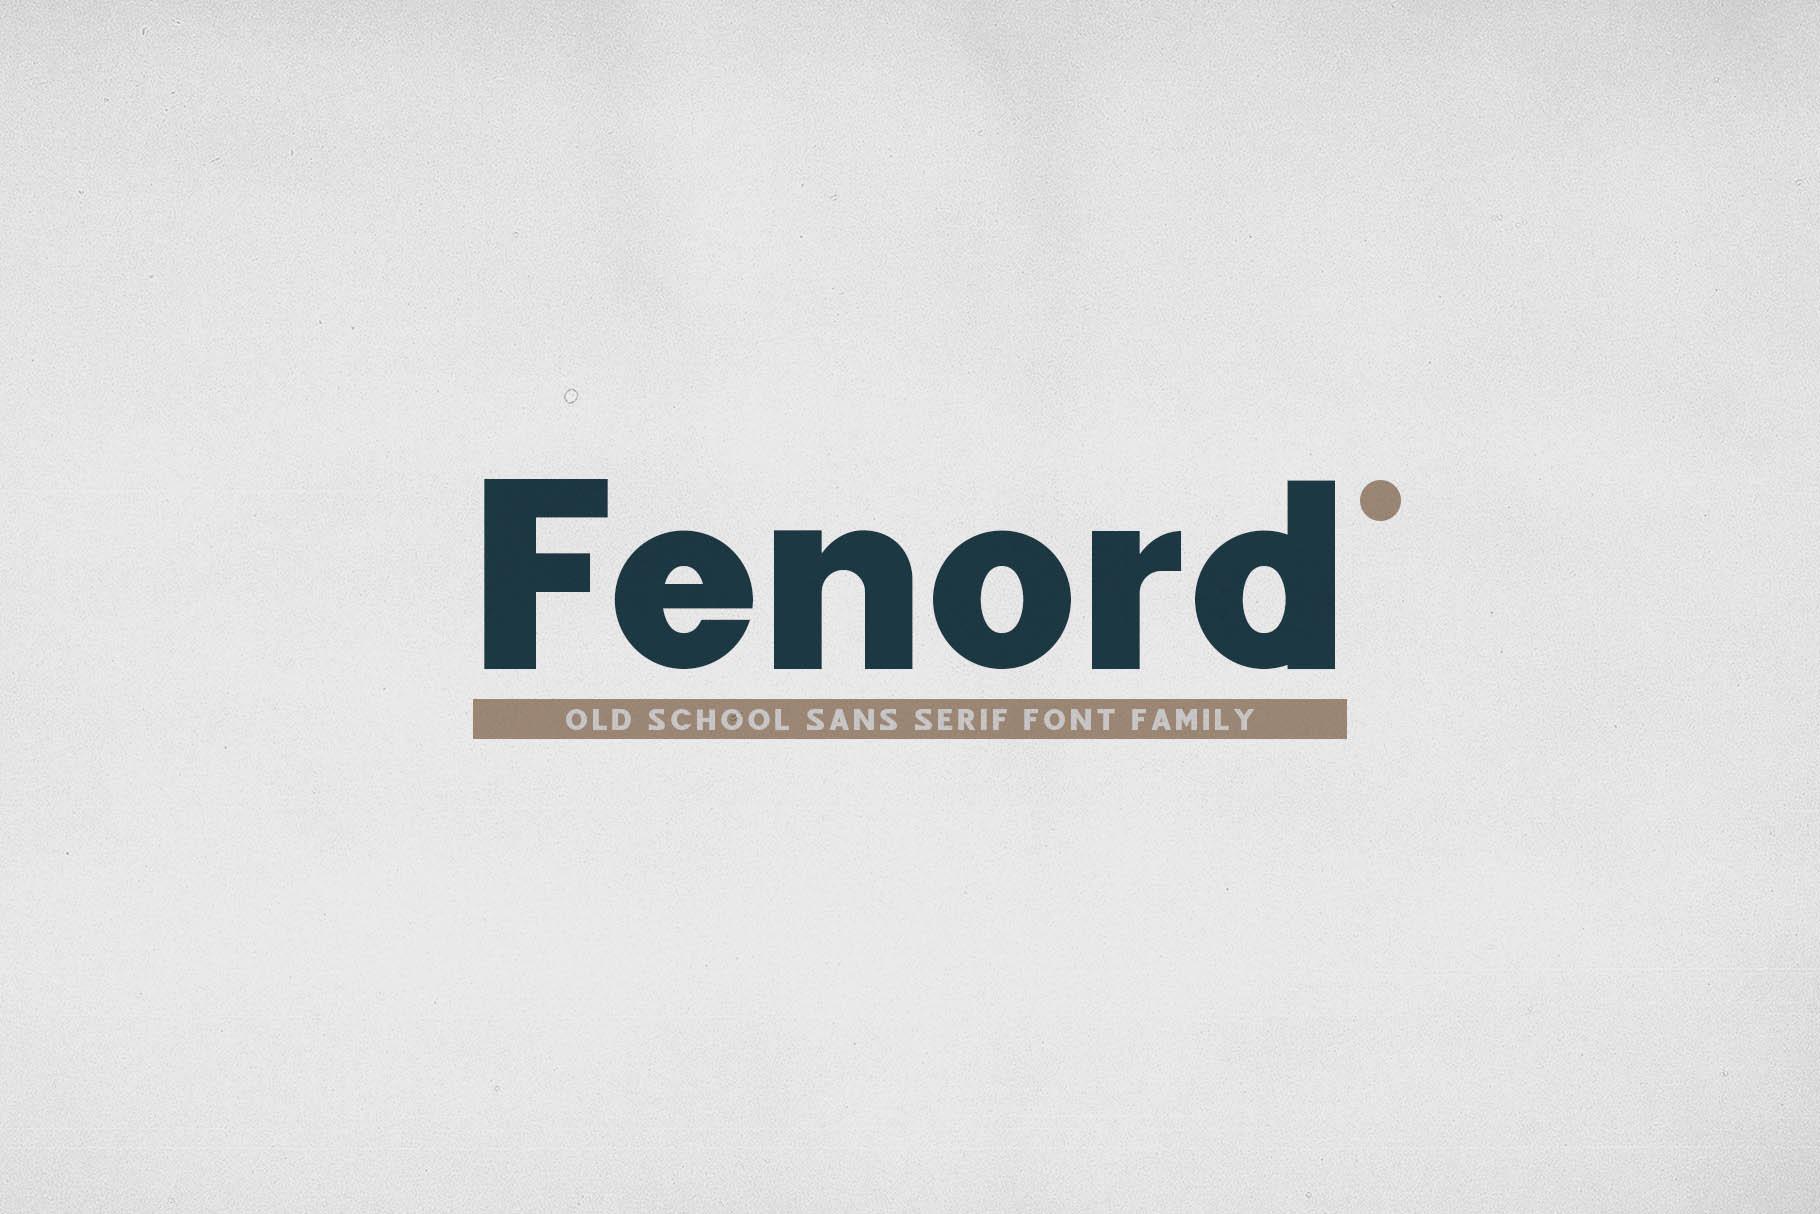 Fenord - Old School Sans Serif example image 1